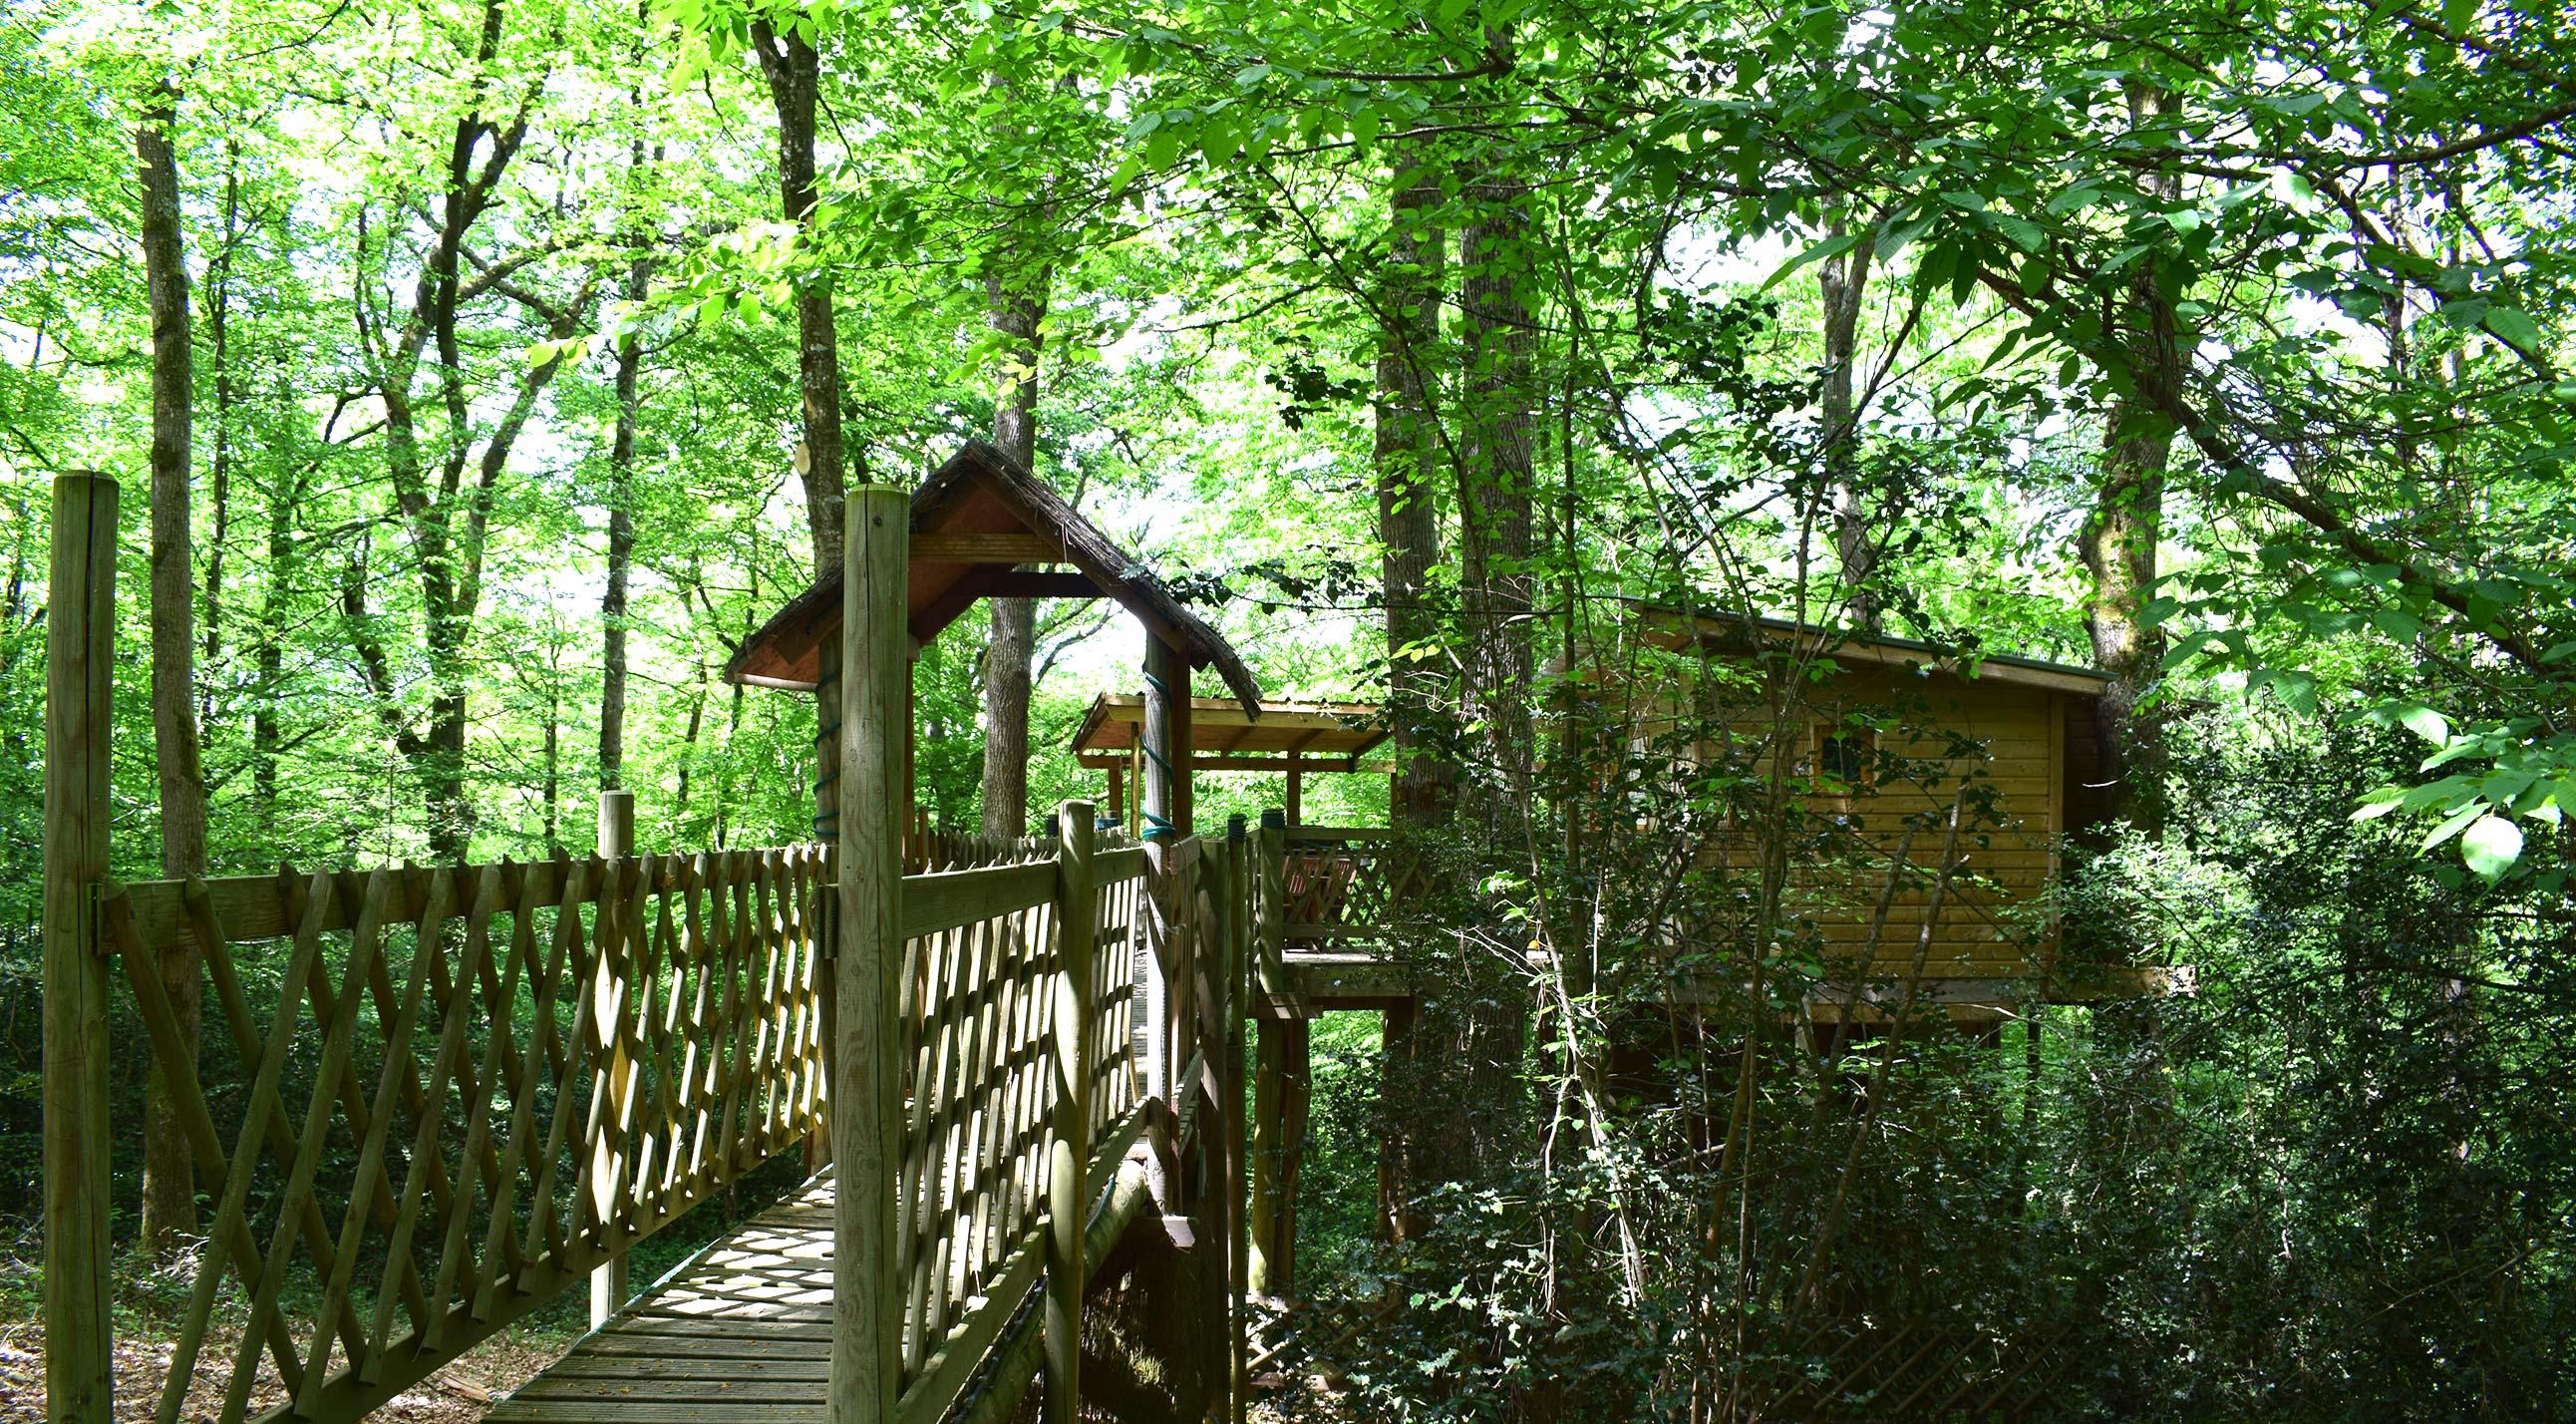 ma cabane dans les arbres location de cabanes dans les. Black Bedroom Furniture Sets. Home Design Ideas